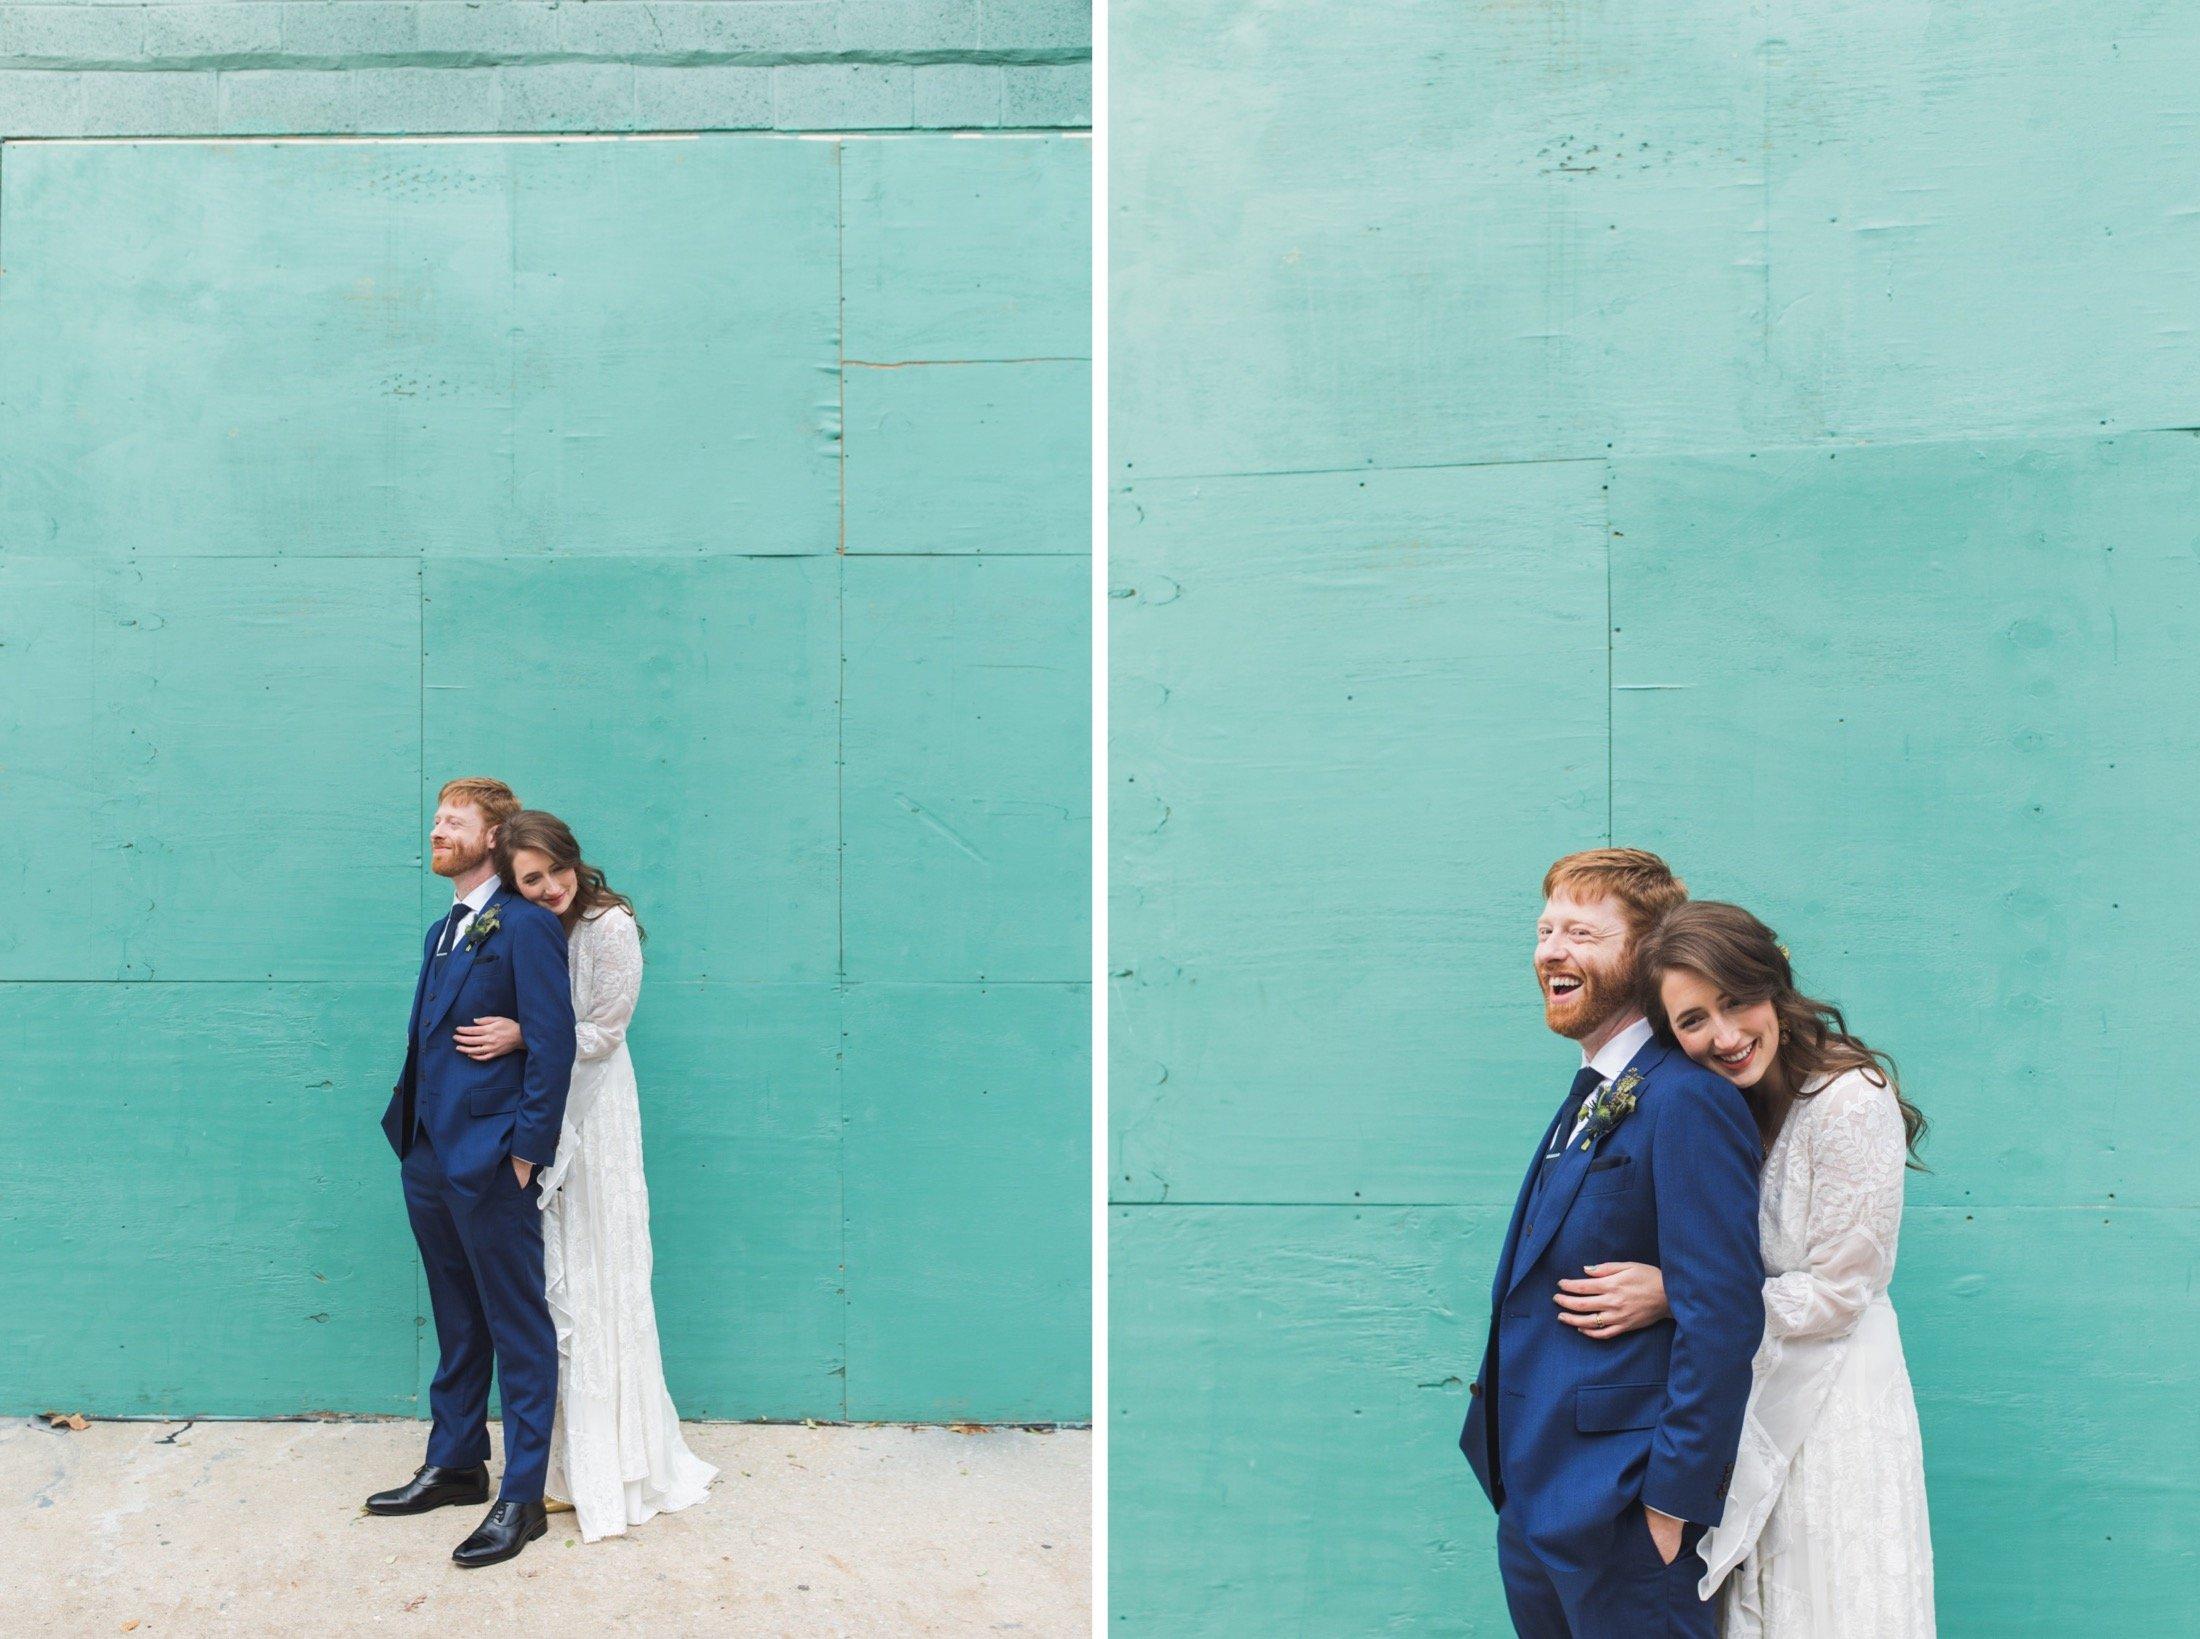 Pemberton, Darien, mural, Philadelphia, wedding, portrait